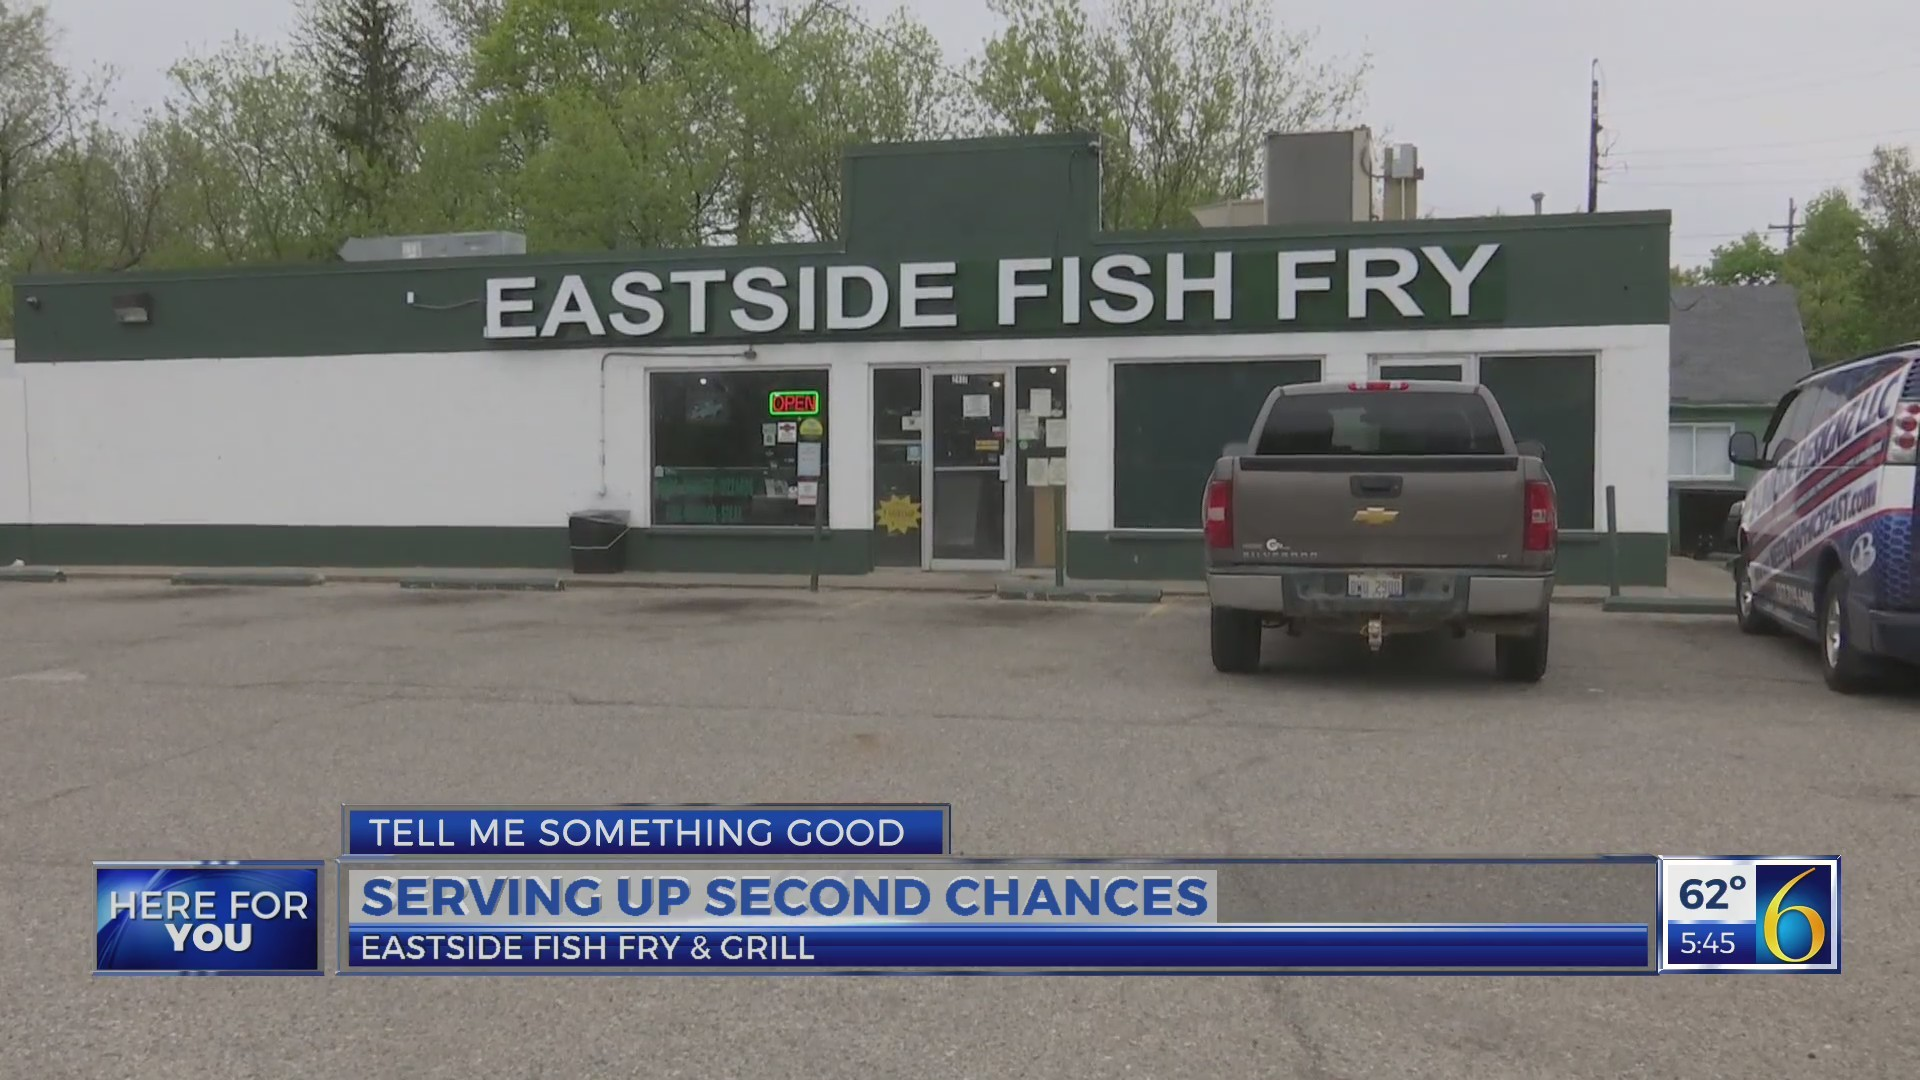 TMSG EASTSIDE FISH FRY